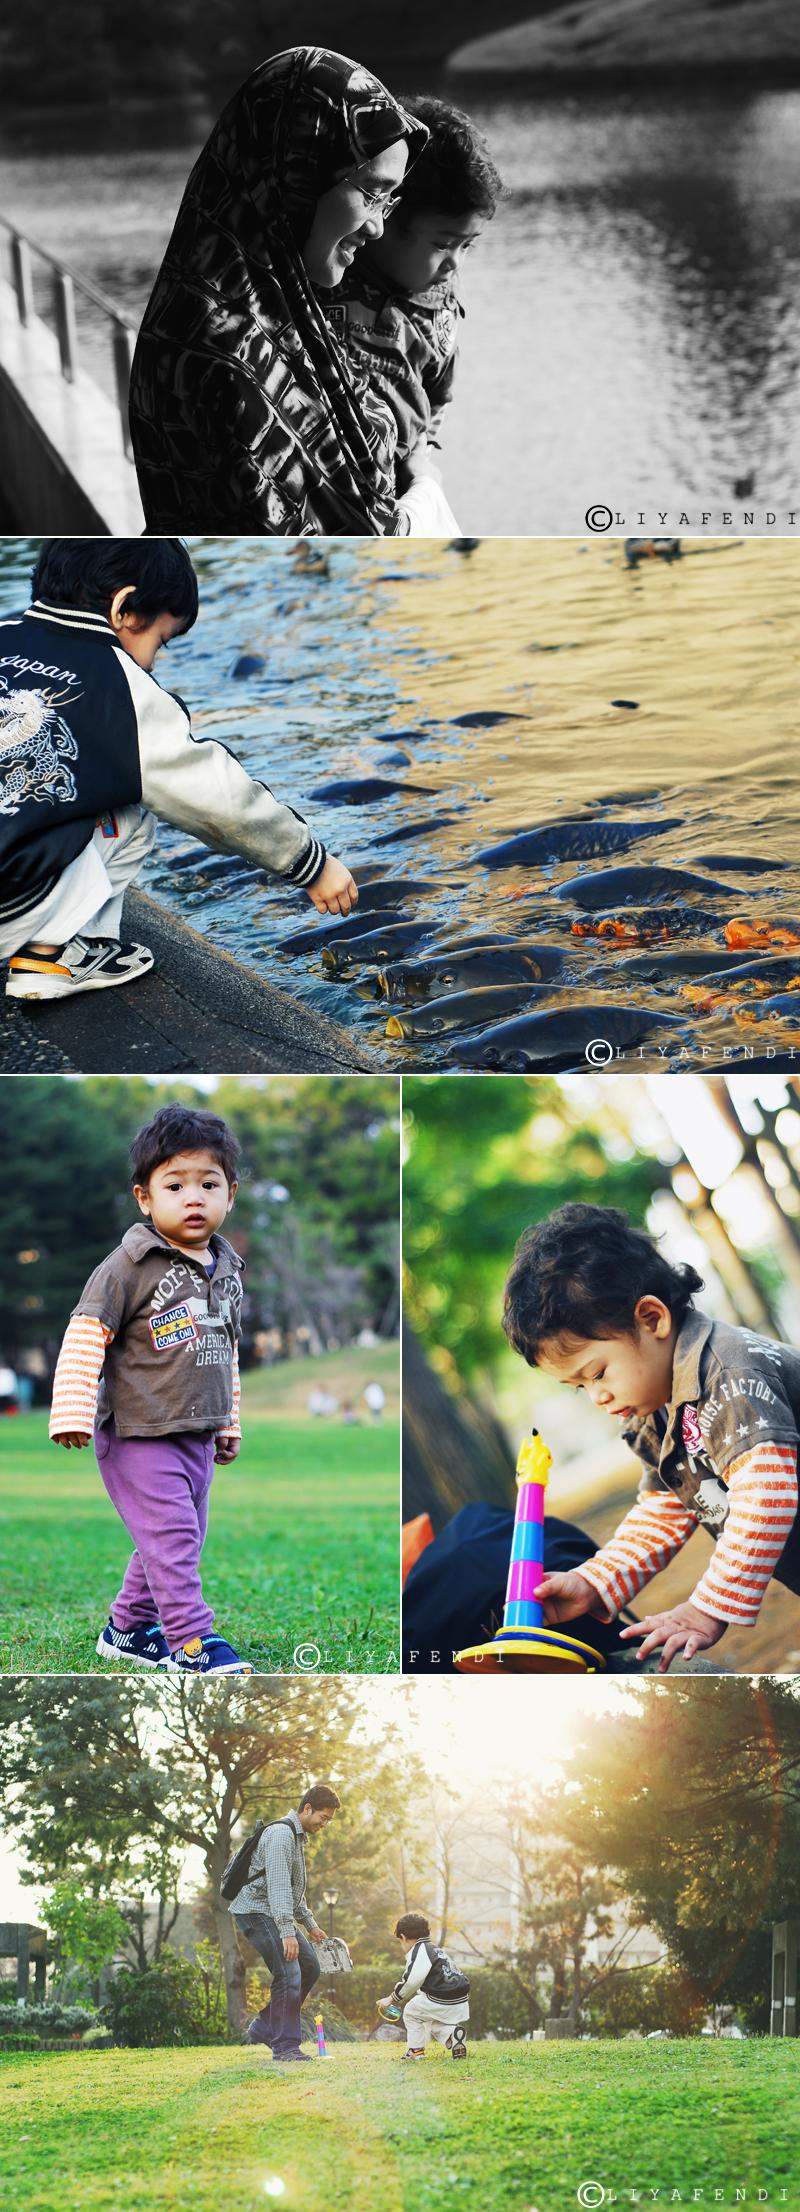 Mitsumi Park